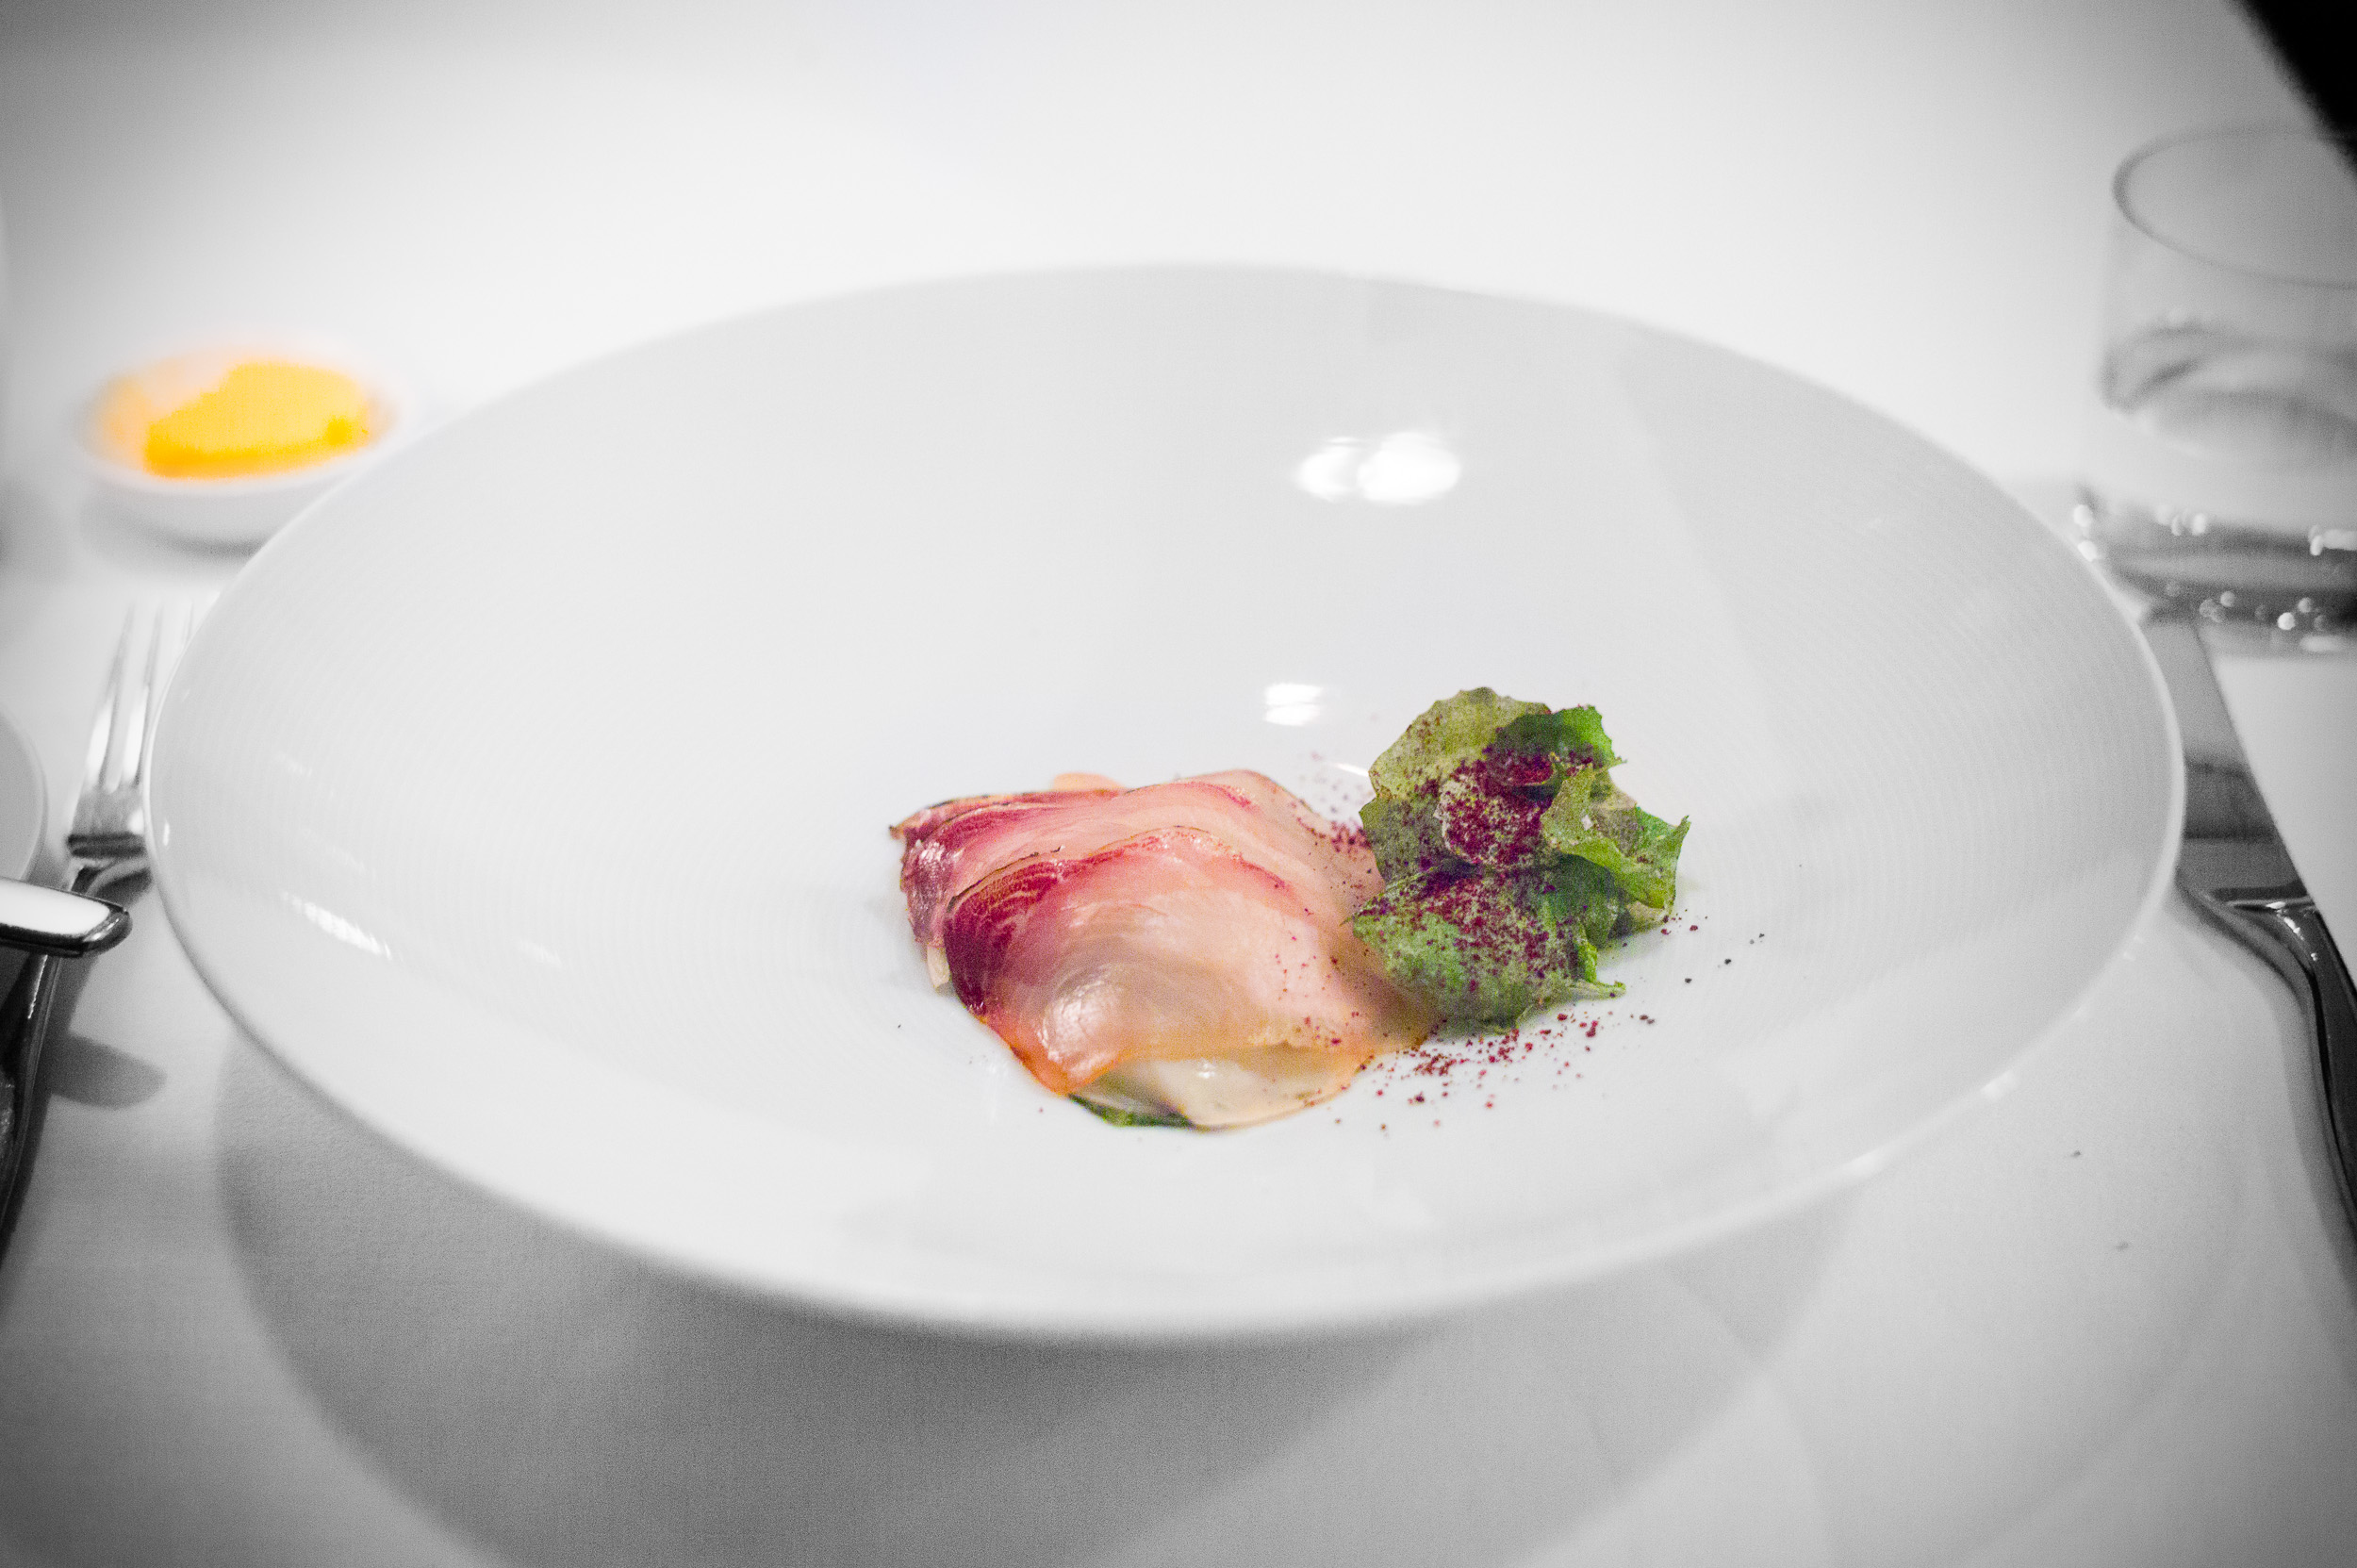 9th Course: Kingfish ham with king oyster mushroom, saltbush, ju